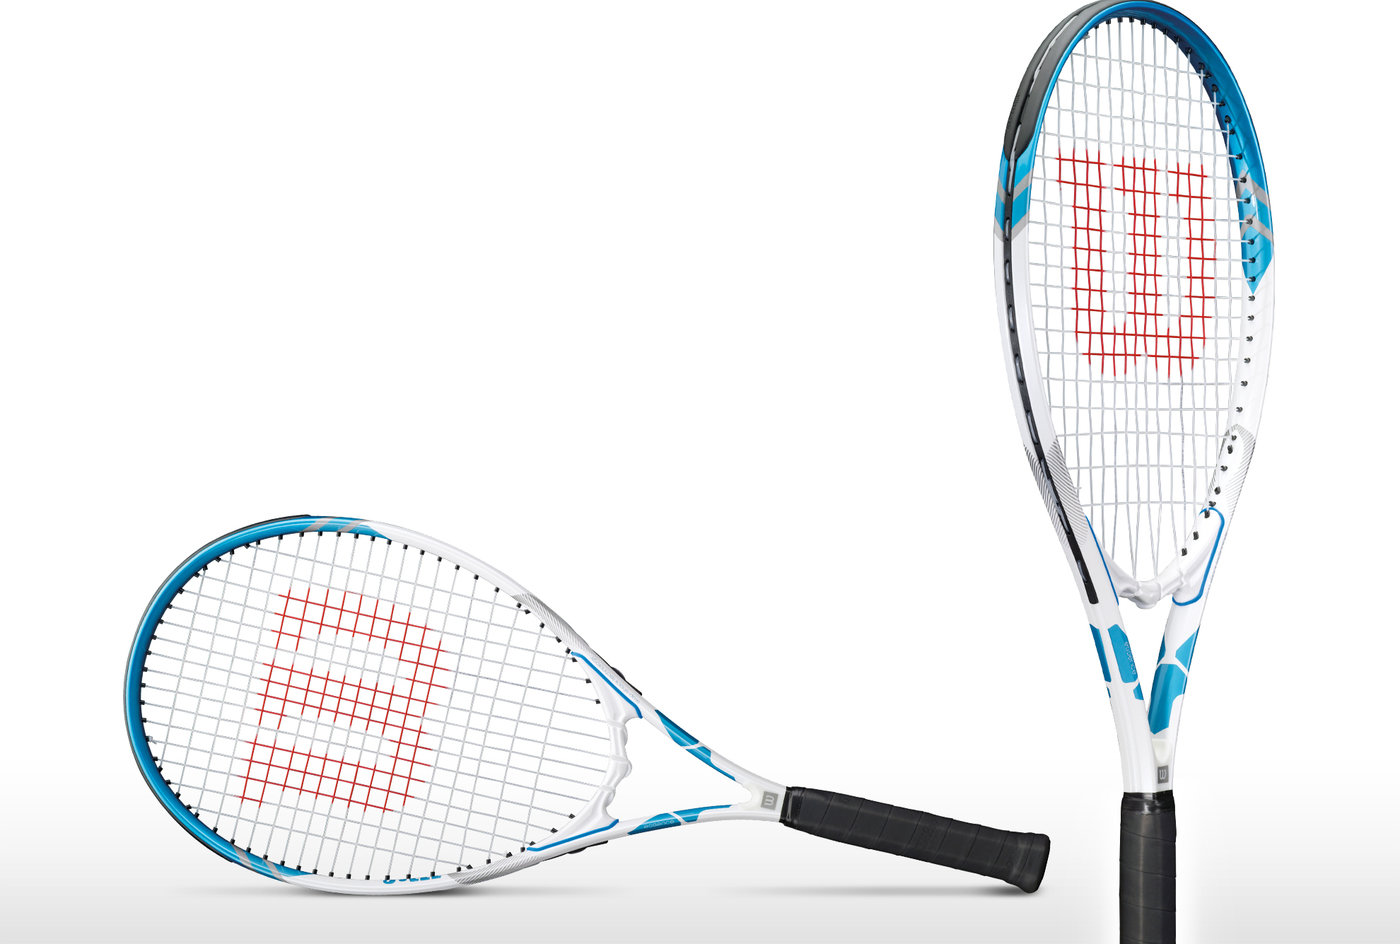 Wilson Tennis Racquets by Eric Duncan at Coroflot com